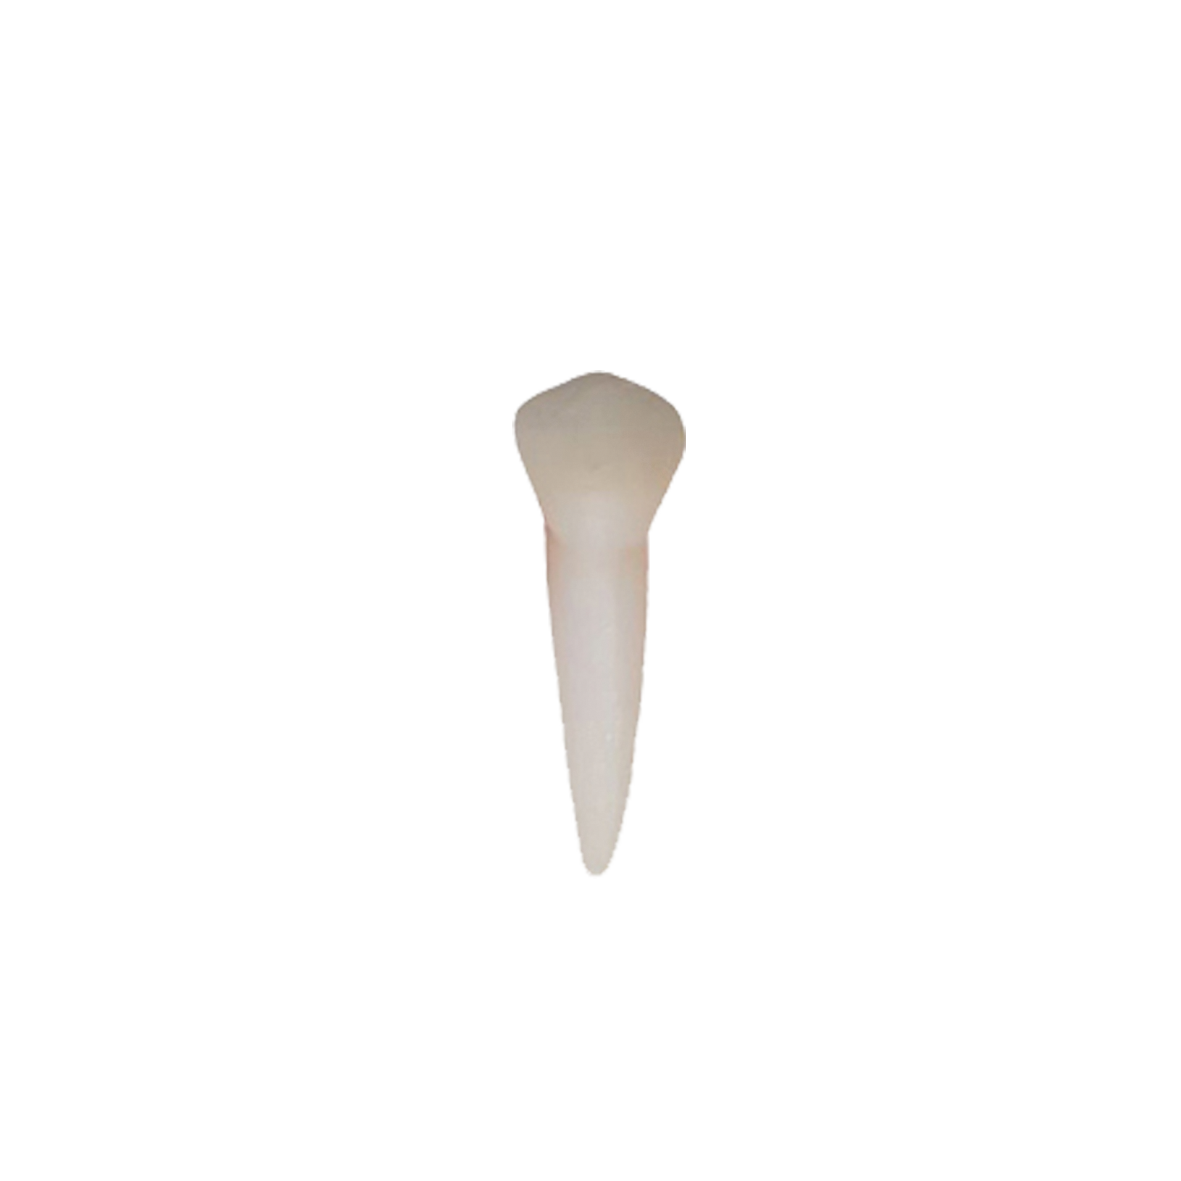 2° pré molar inferior